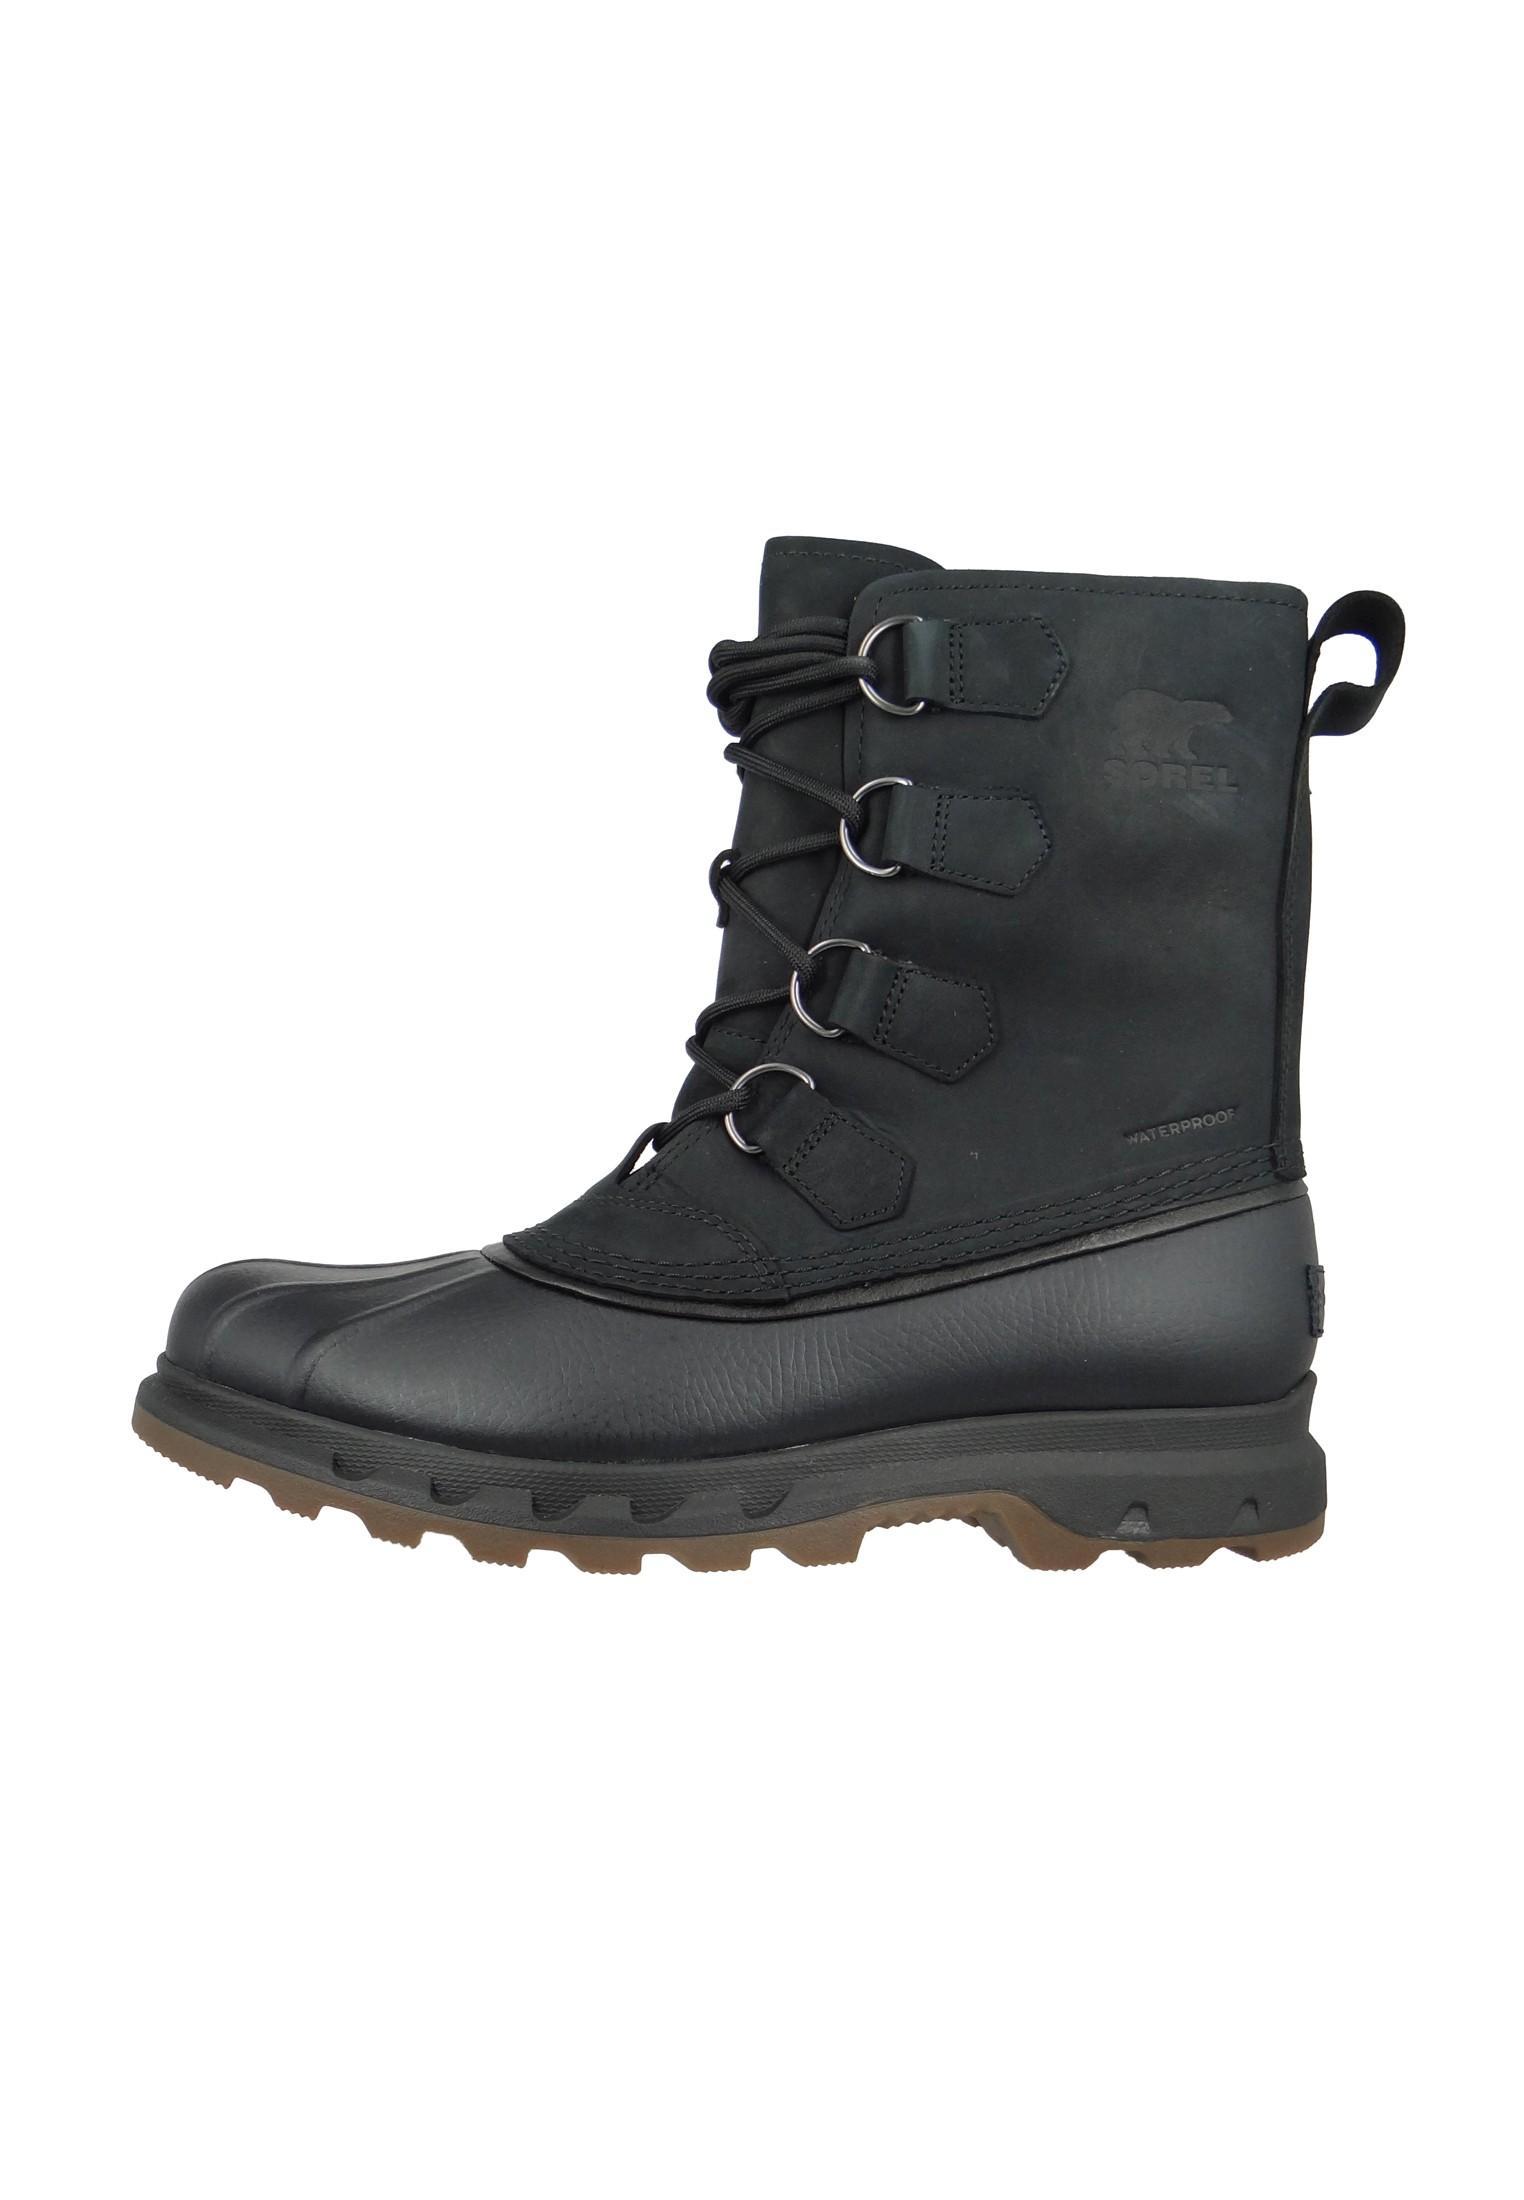 Sorel Men Winter Boots Winter Boots NM2632-010 PORTZMAN CLASSIC Black Black  – Bild 3 425d2e9c1e